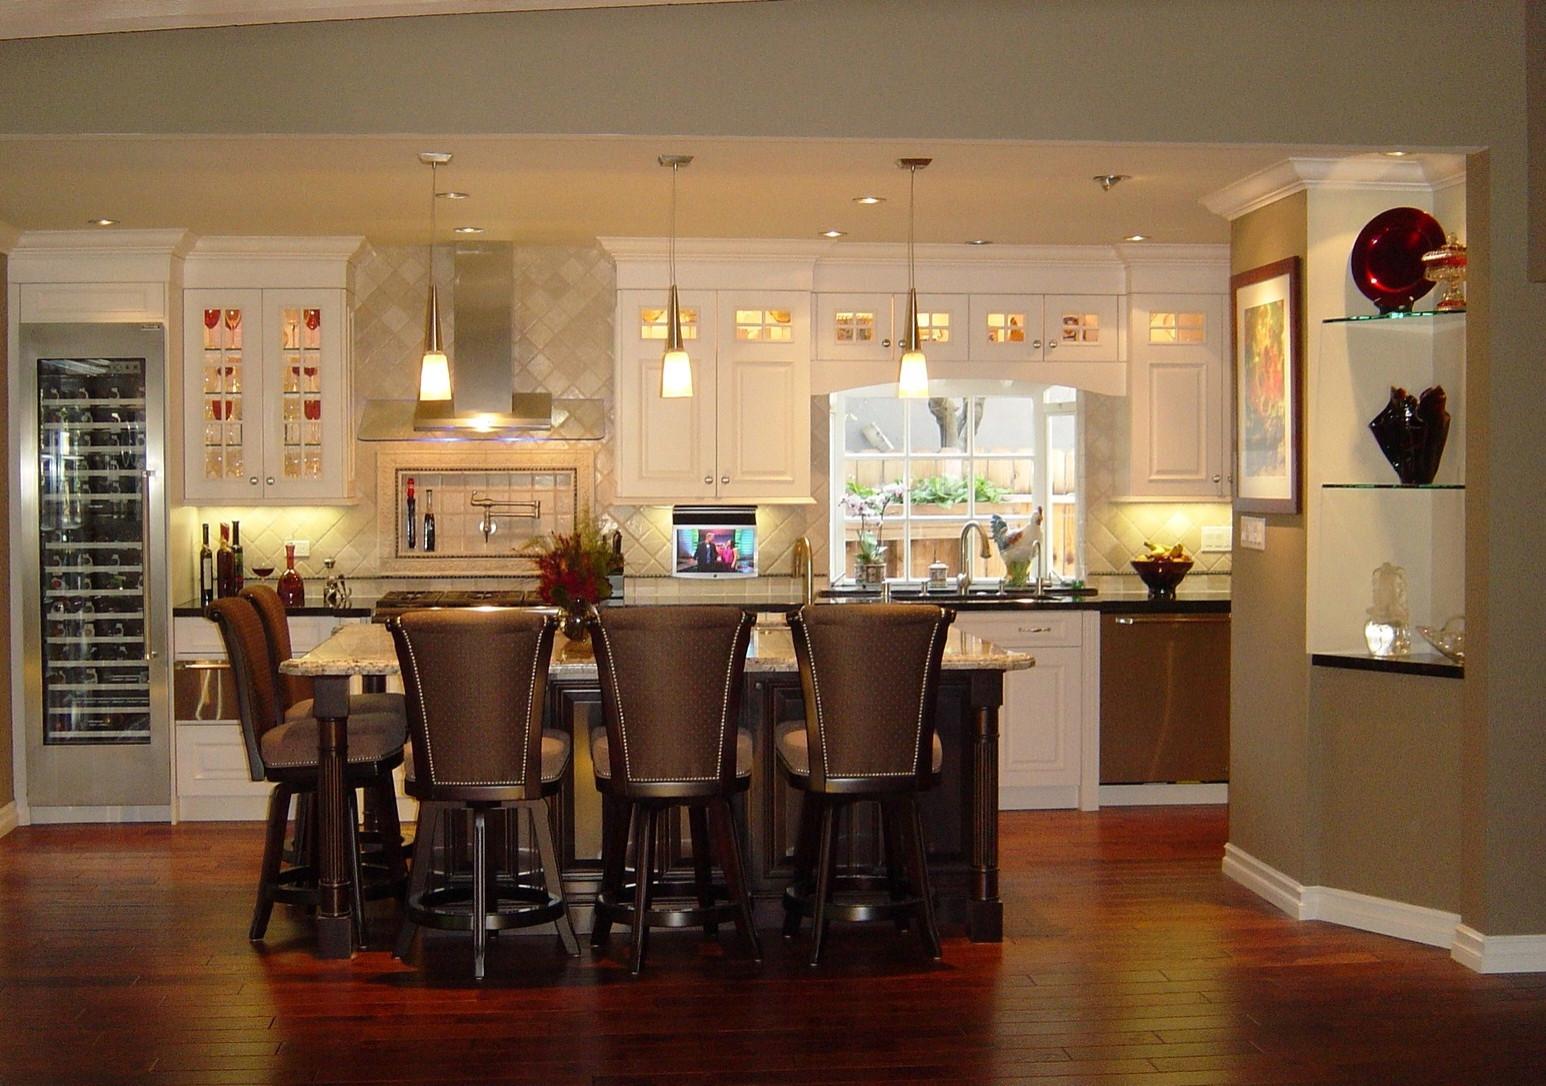 The Sherwood Kitchen and Bath Spa Remodel, La Canada, Ca.